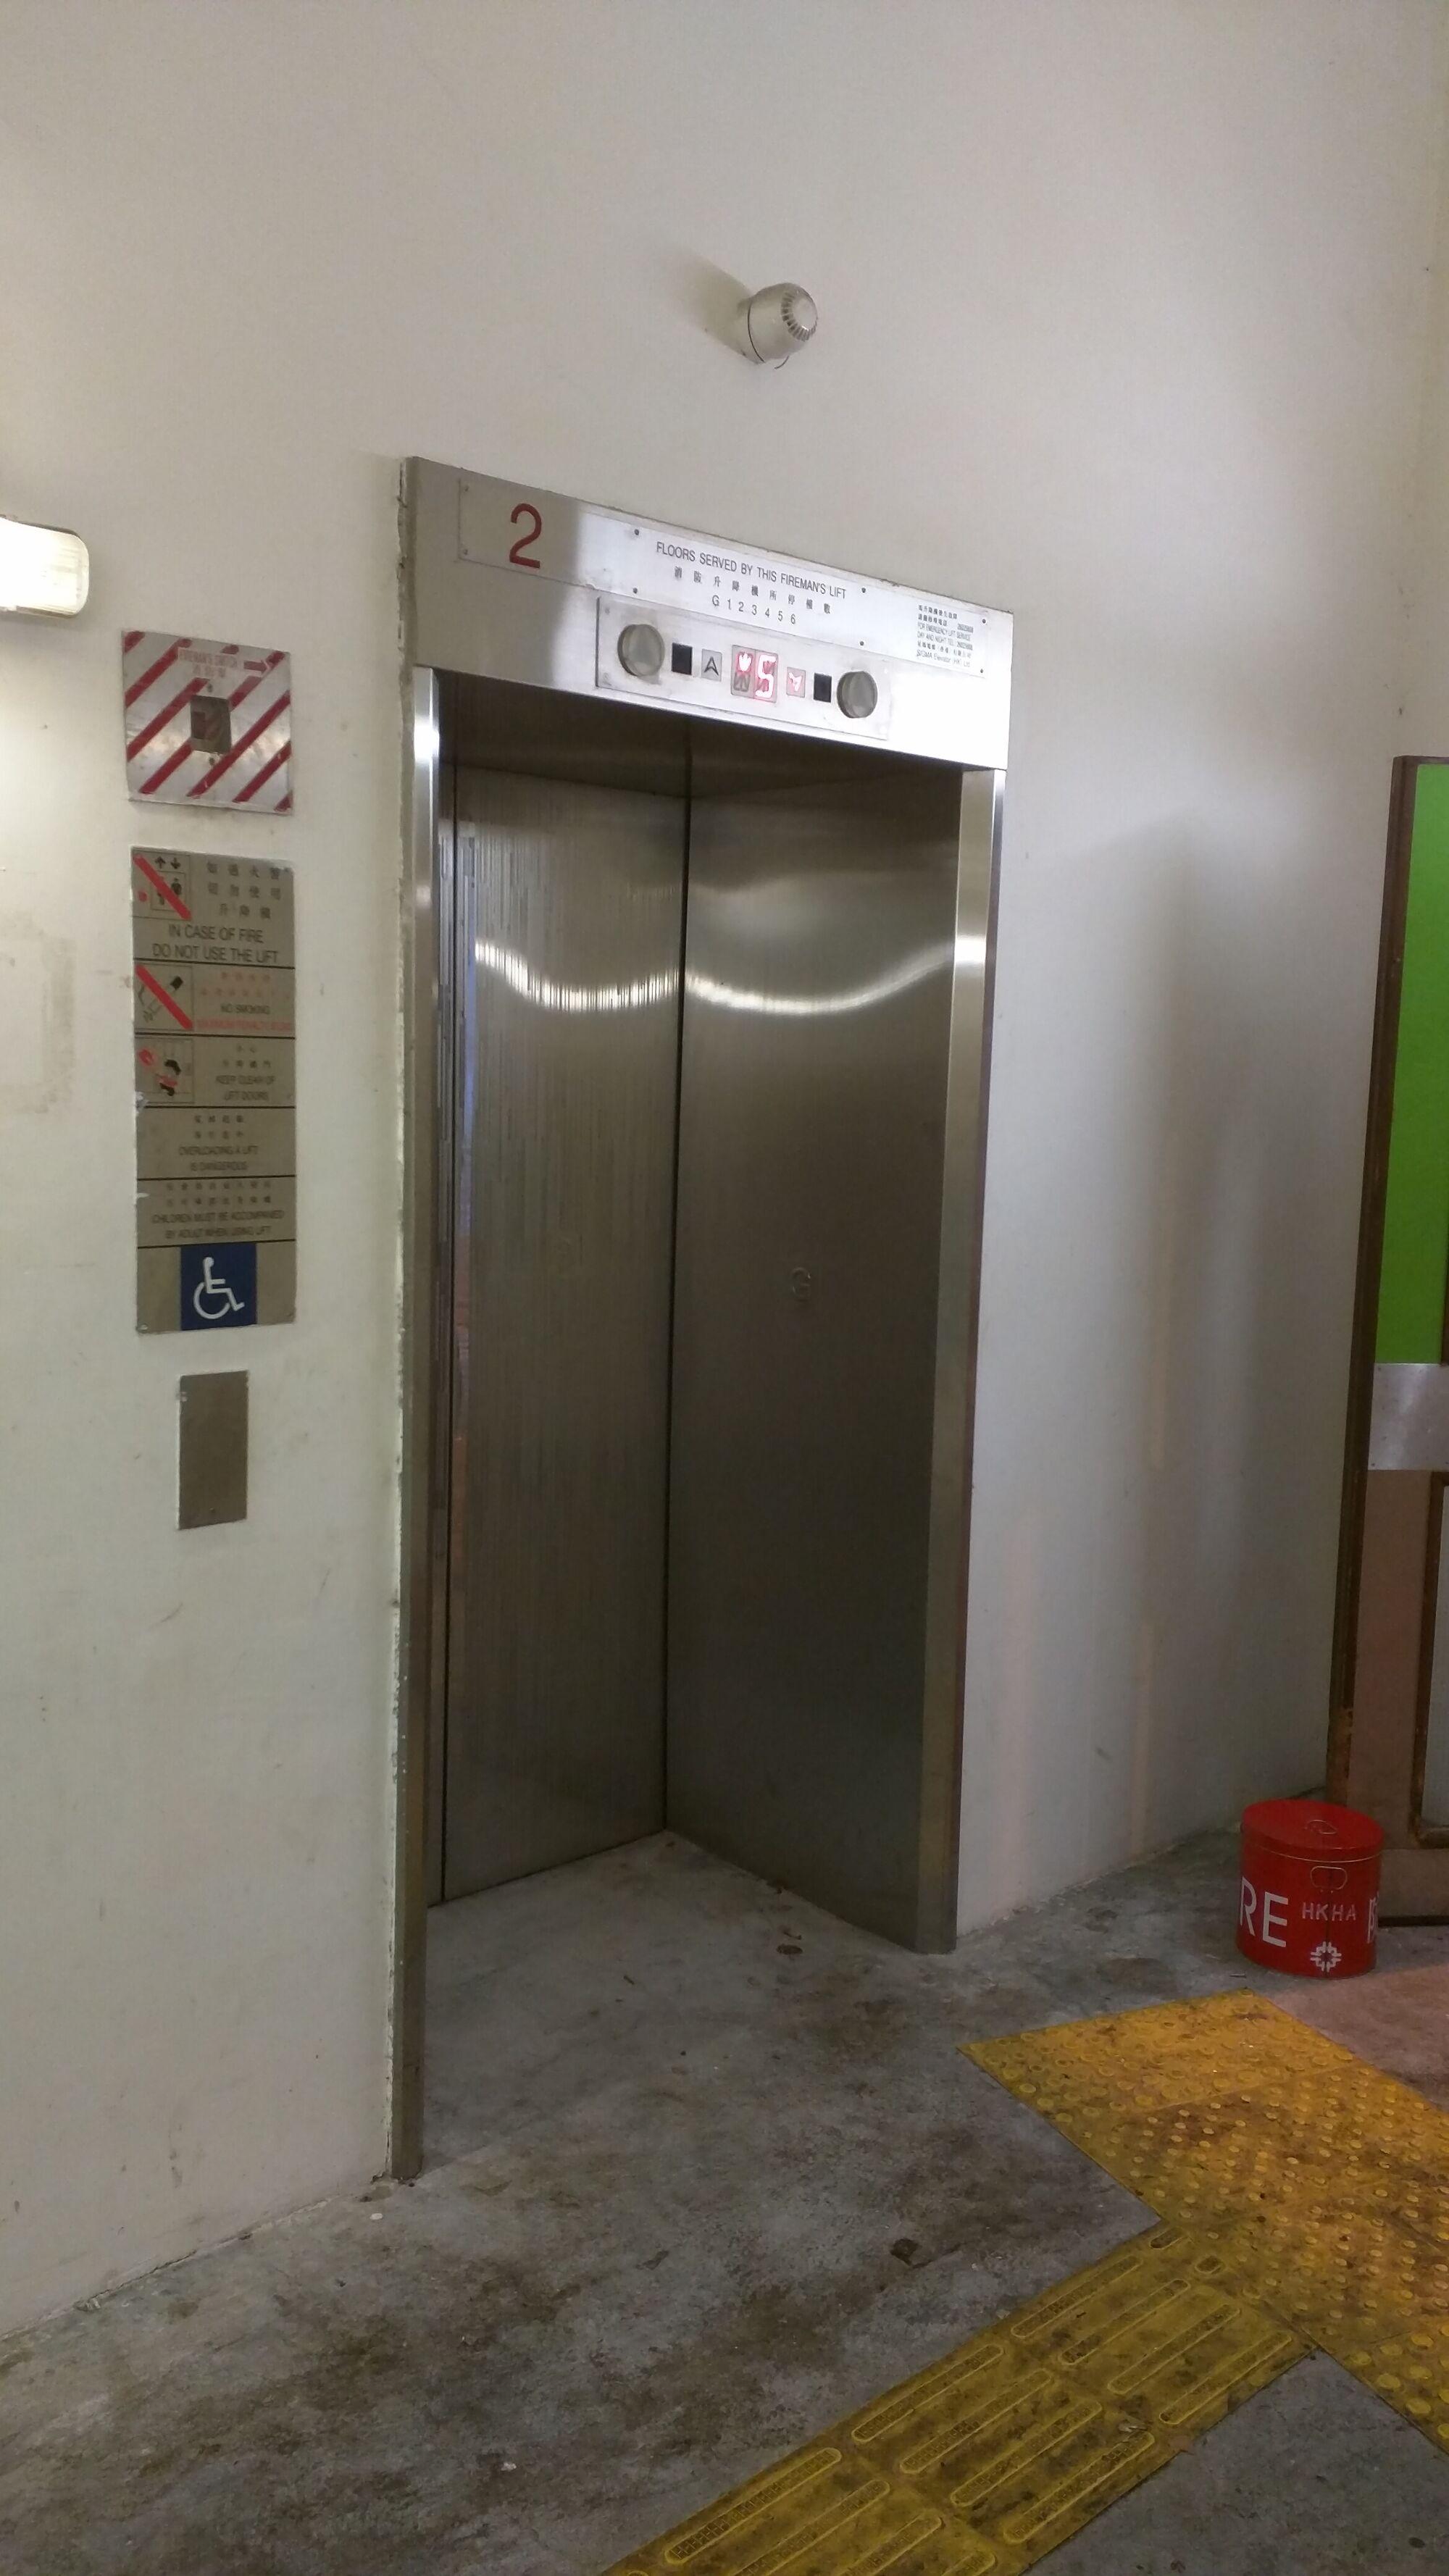 Fireman S Elevator Elevator Wiki Fandom Powered By Wikia